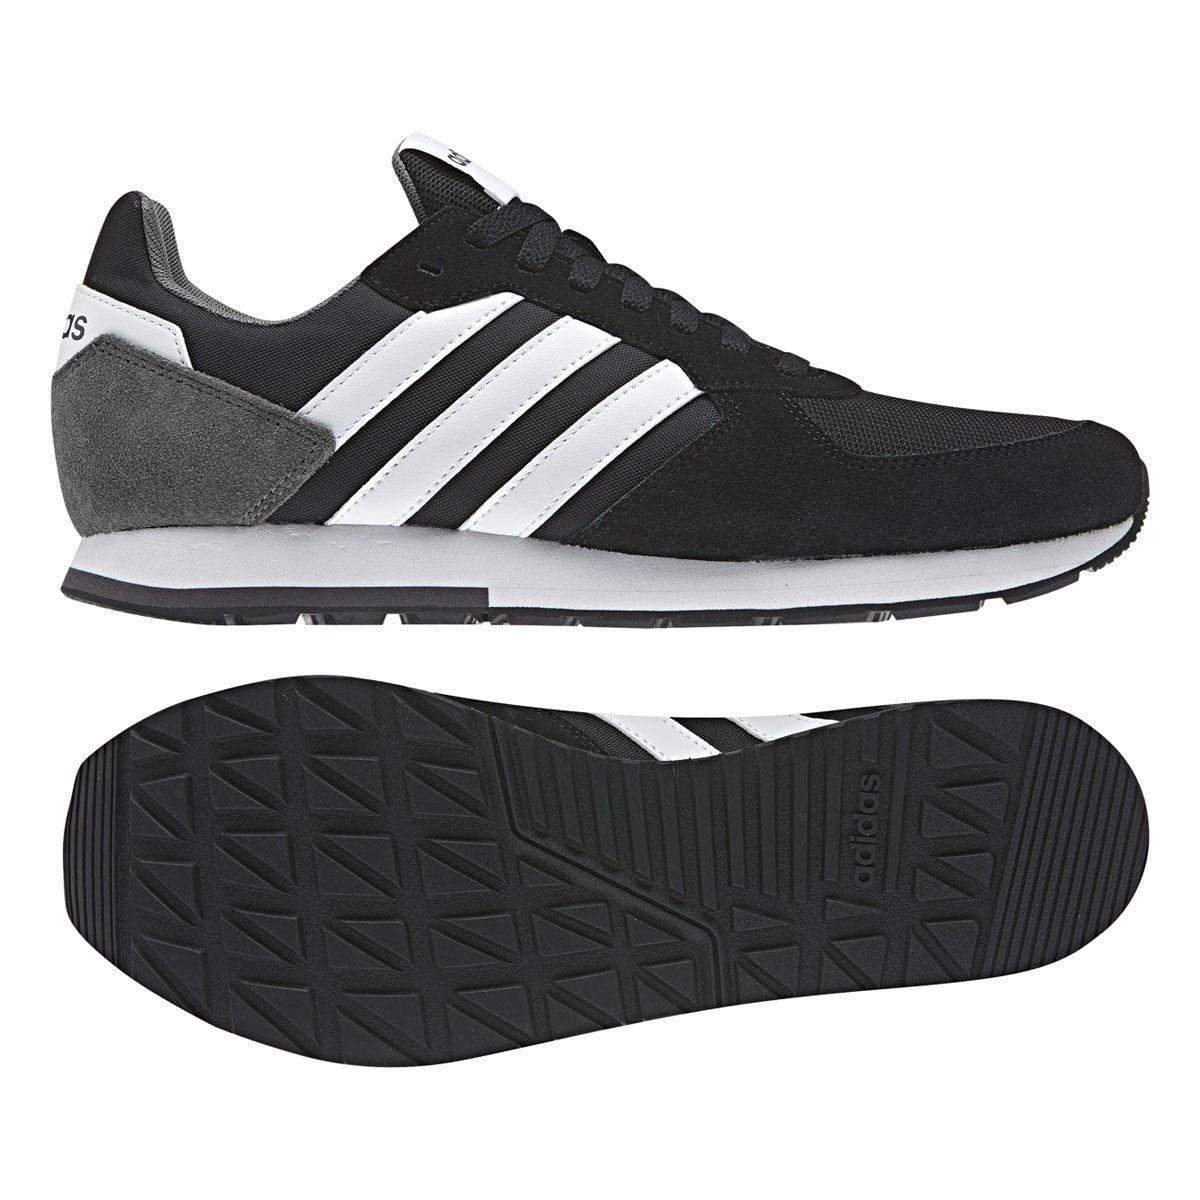 A pie despierta entrada  Tenis Running 8K Adidas - Caballero